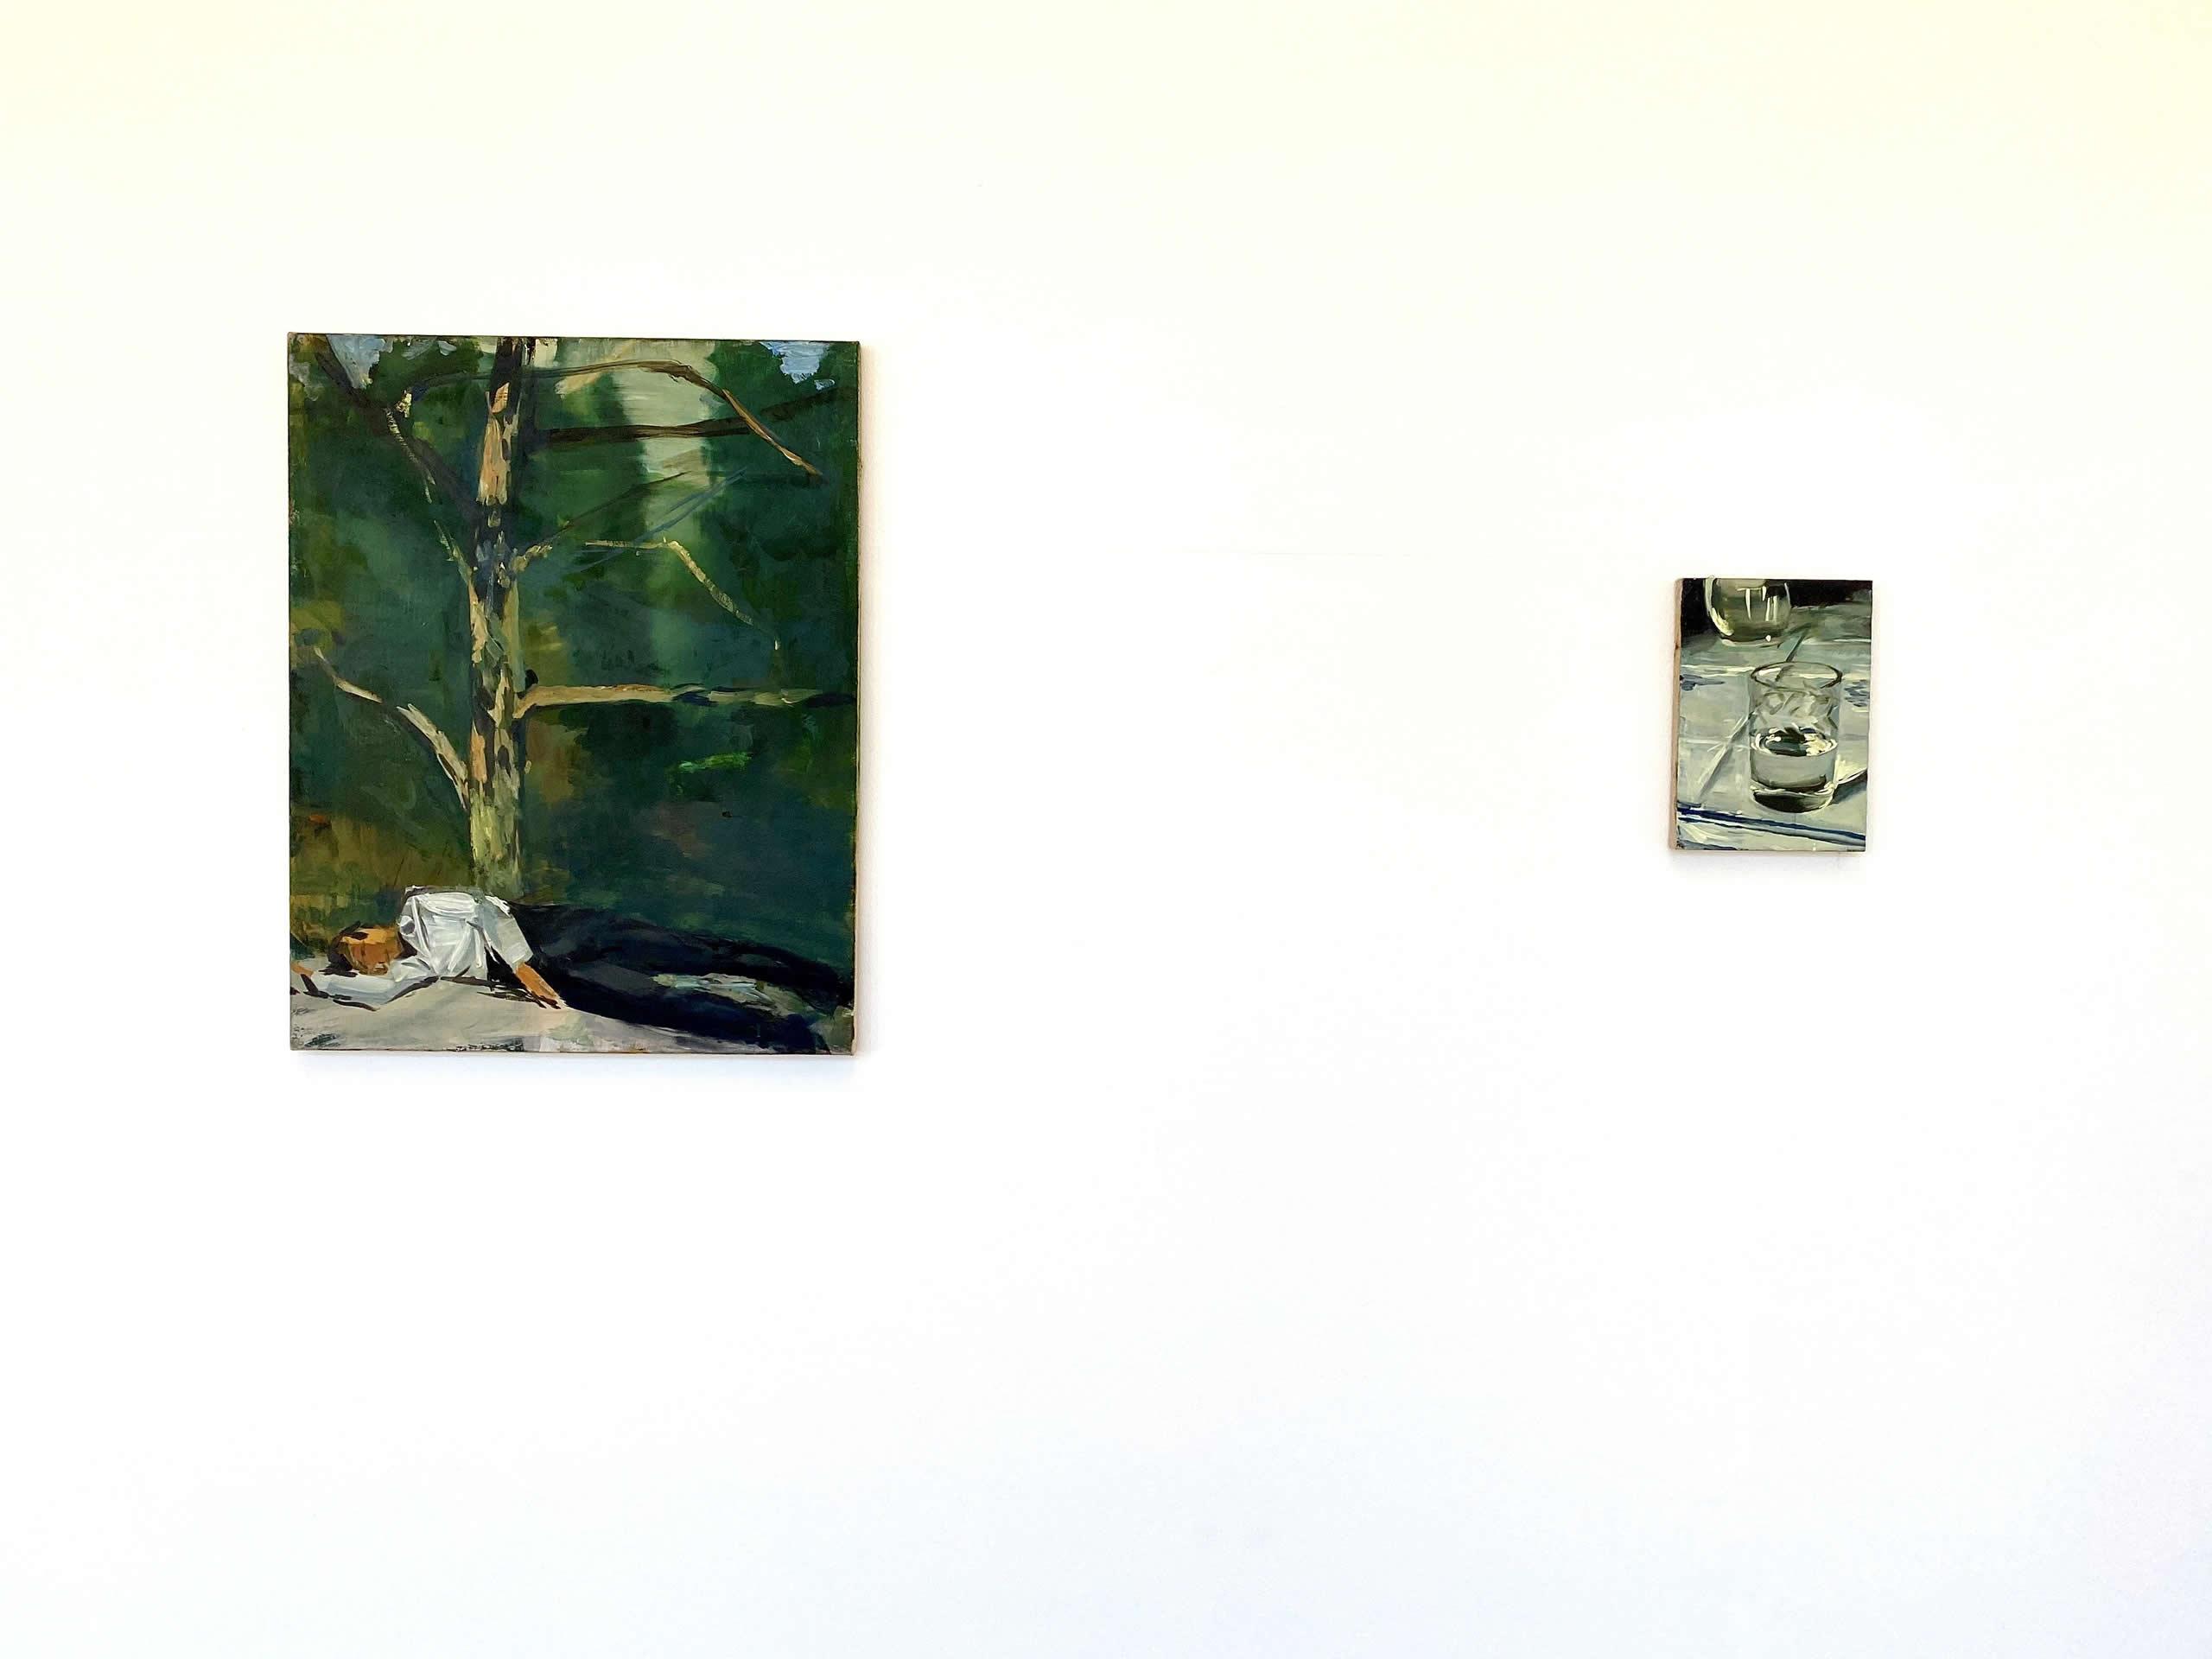 Alex Amann | Ansicht | plaisirs simples | Galerie3